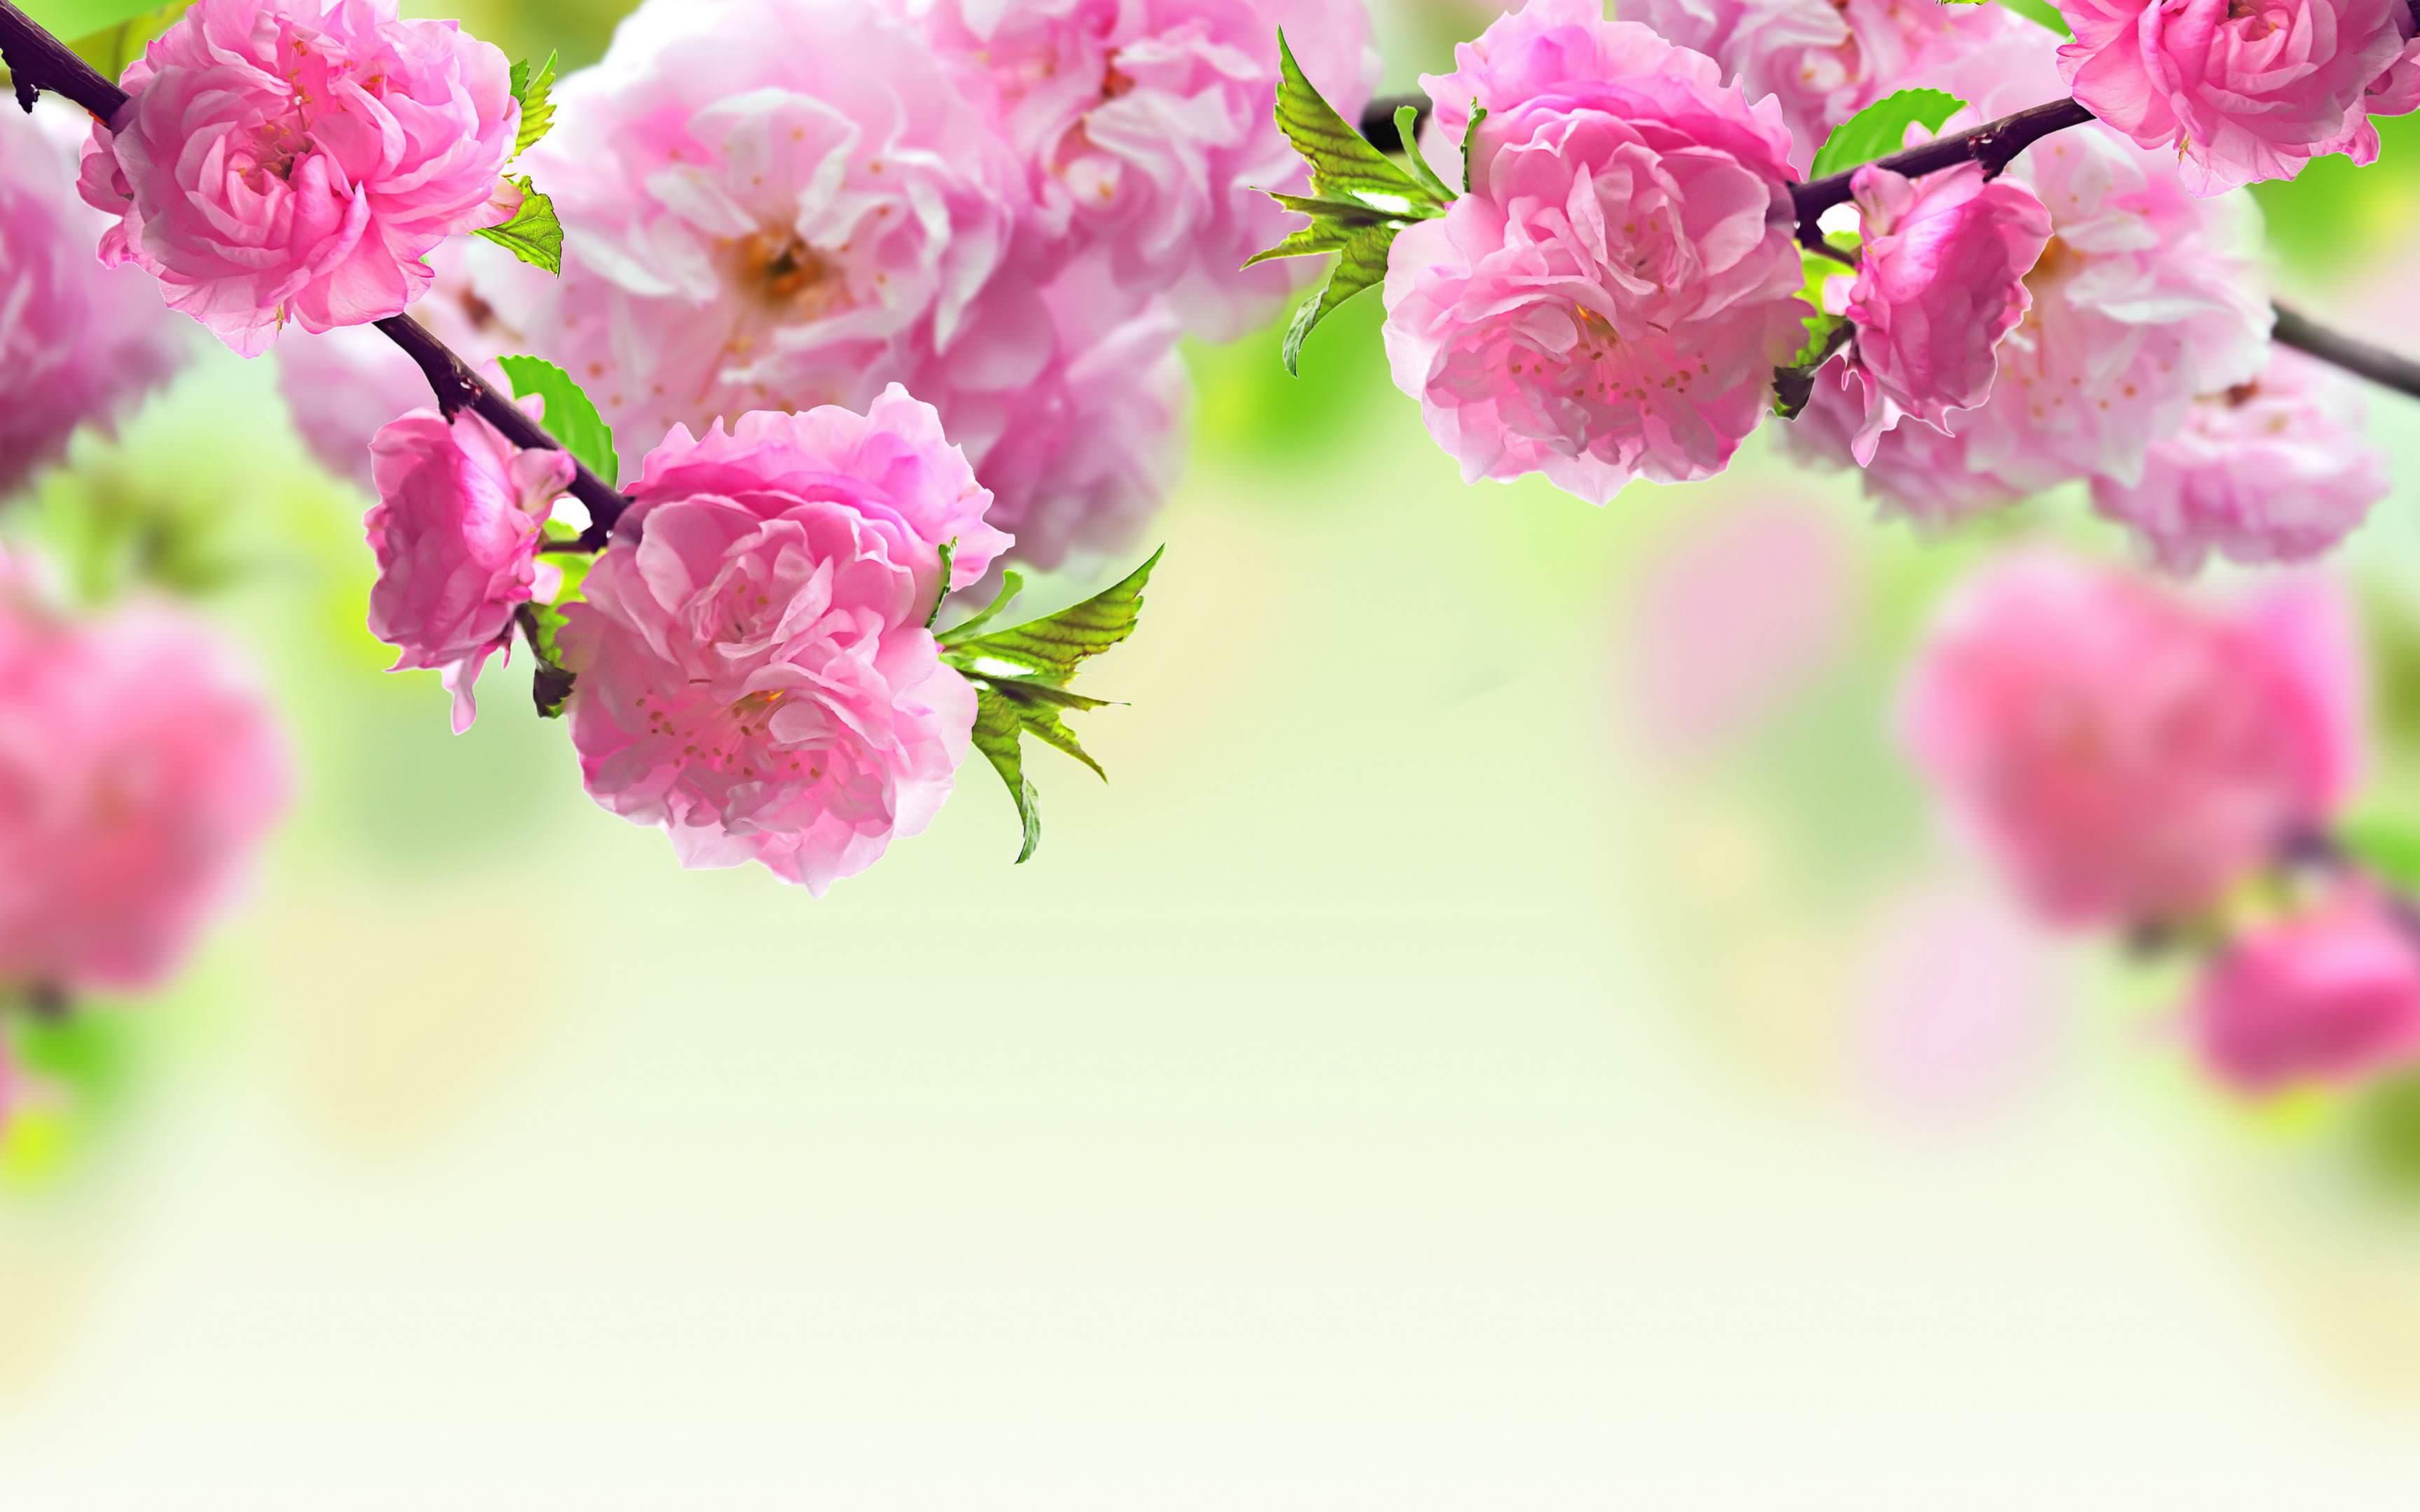 Cute Flower Backgrounds - Flowers Healthy